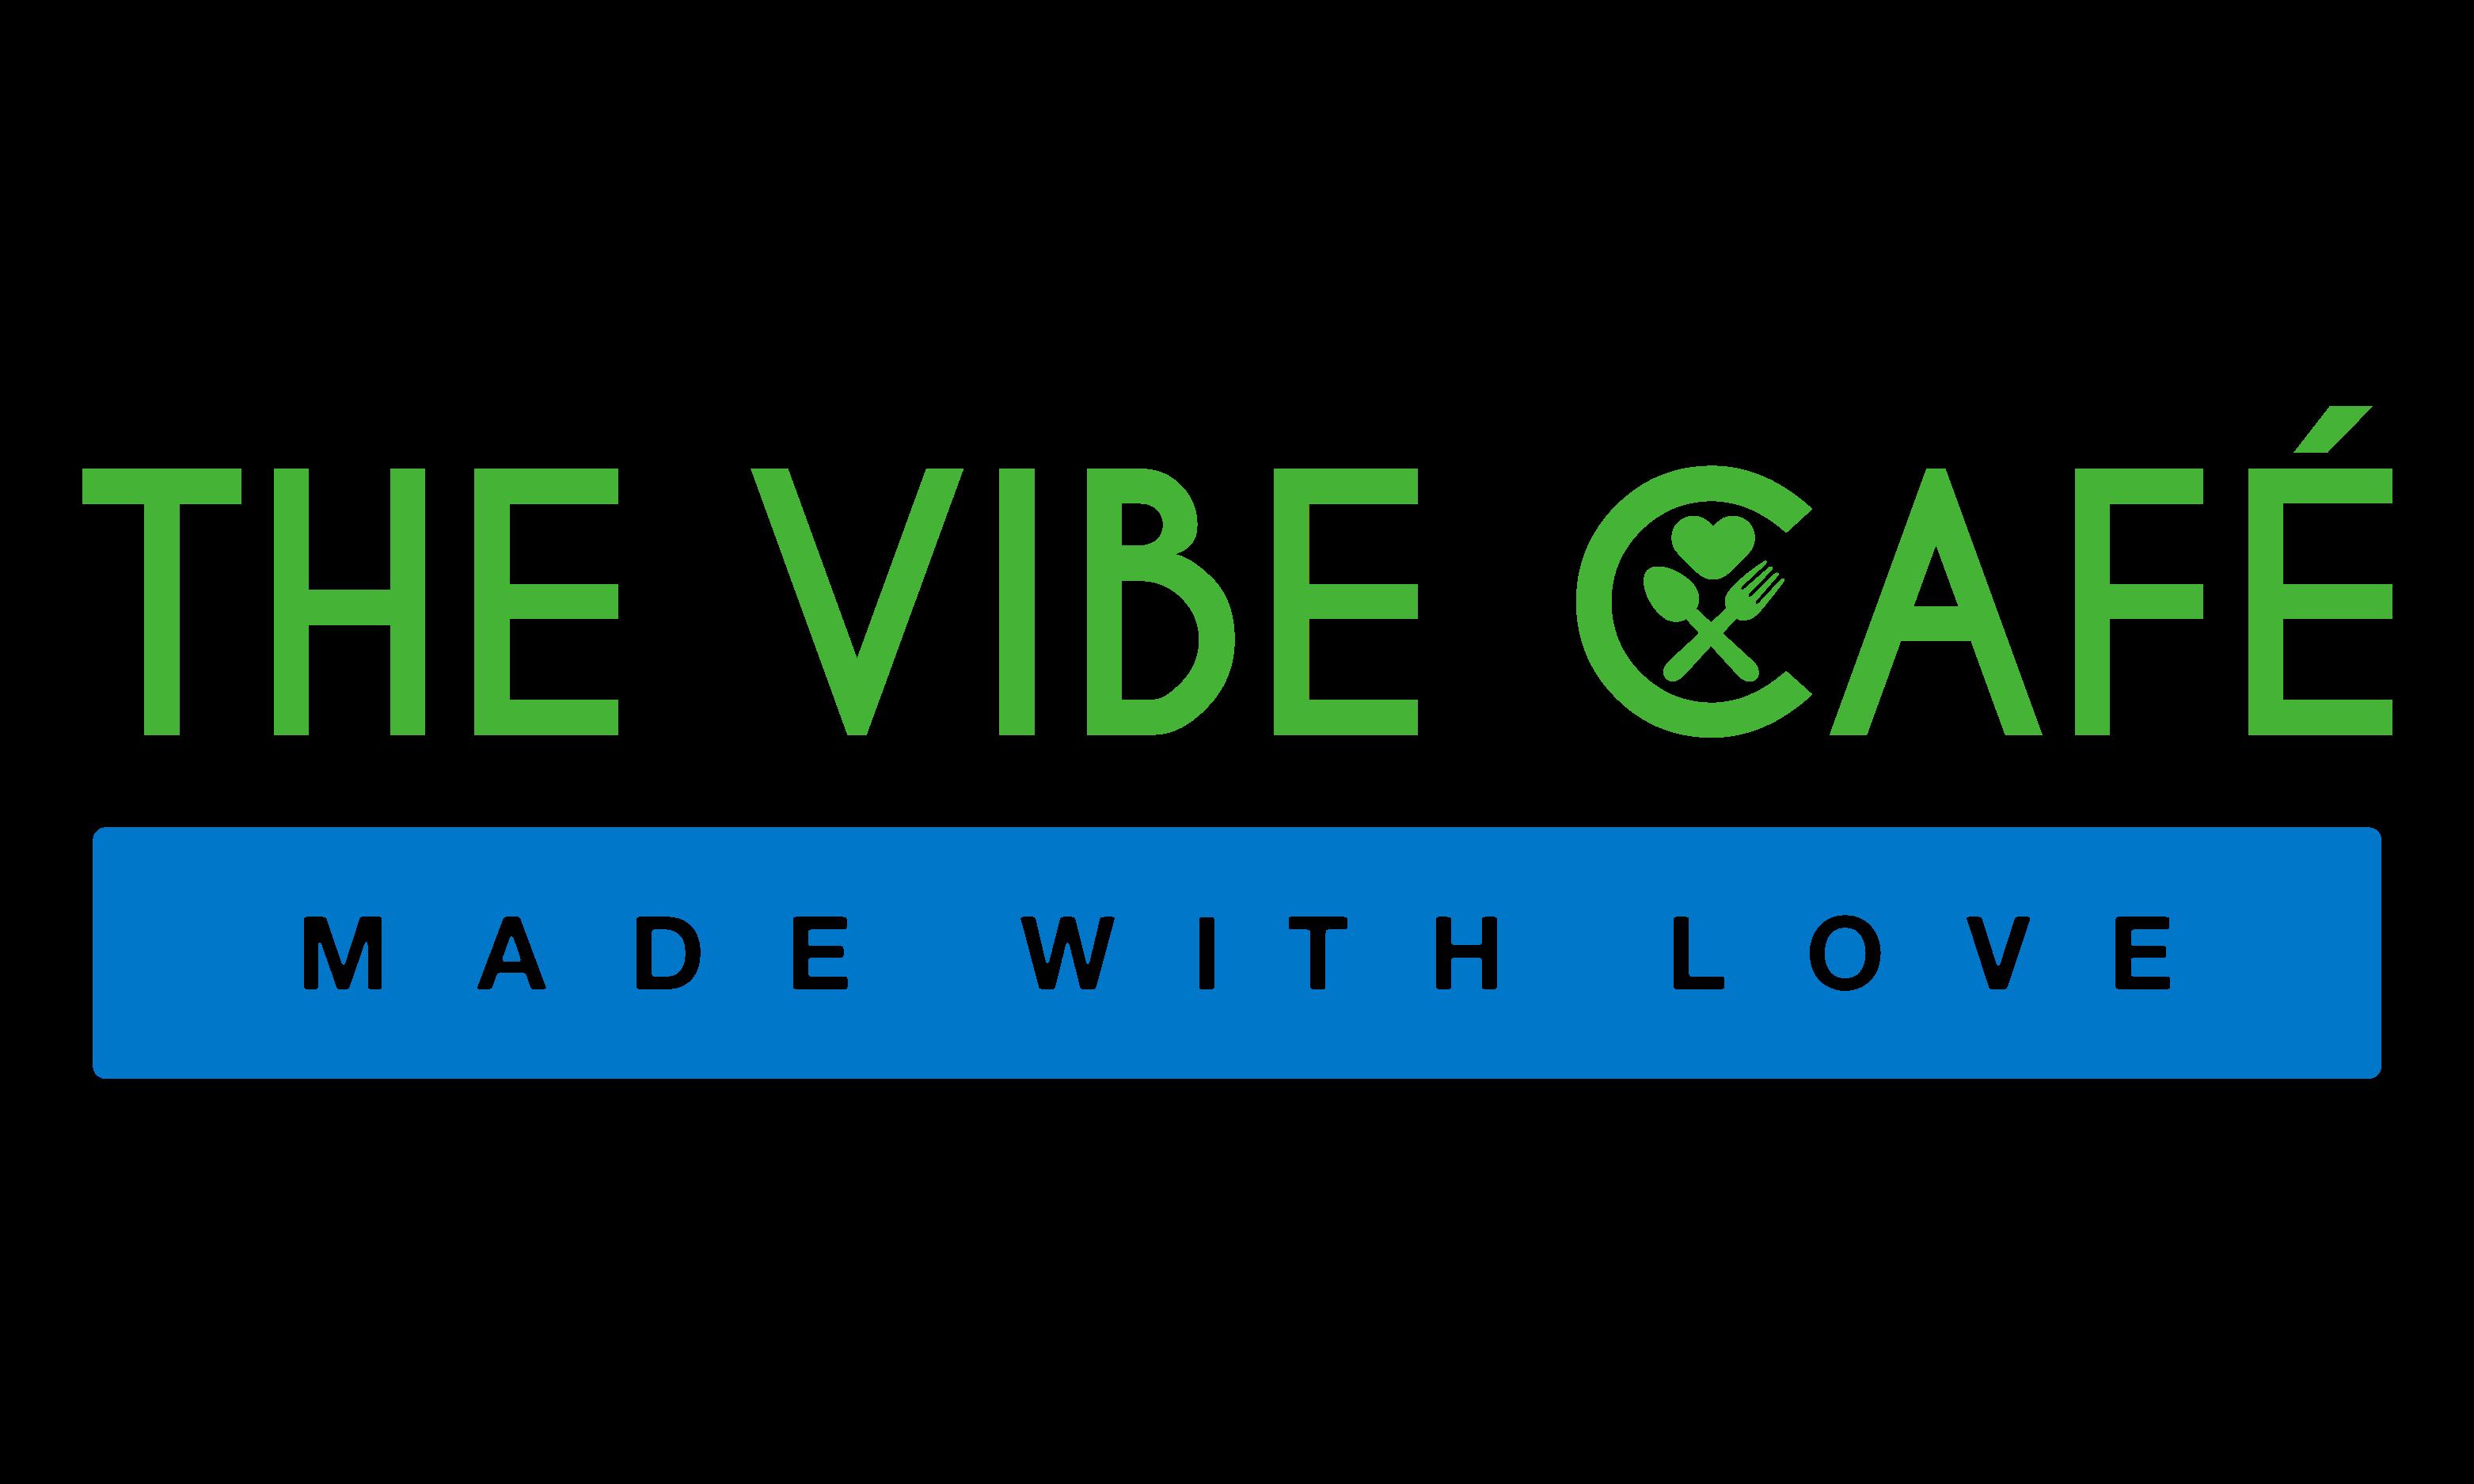 The Vibe Café